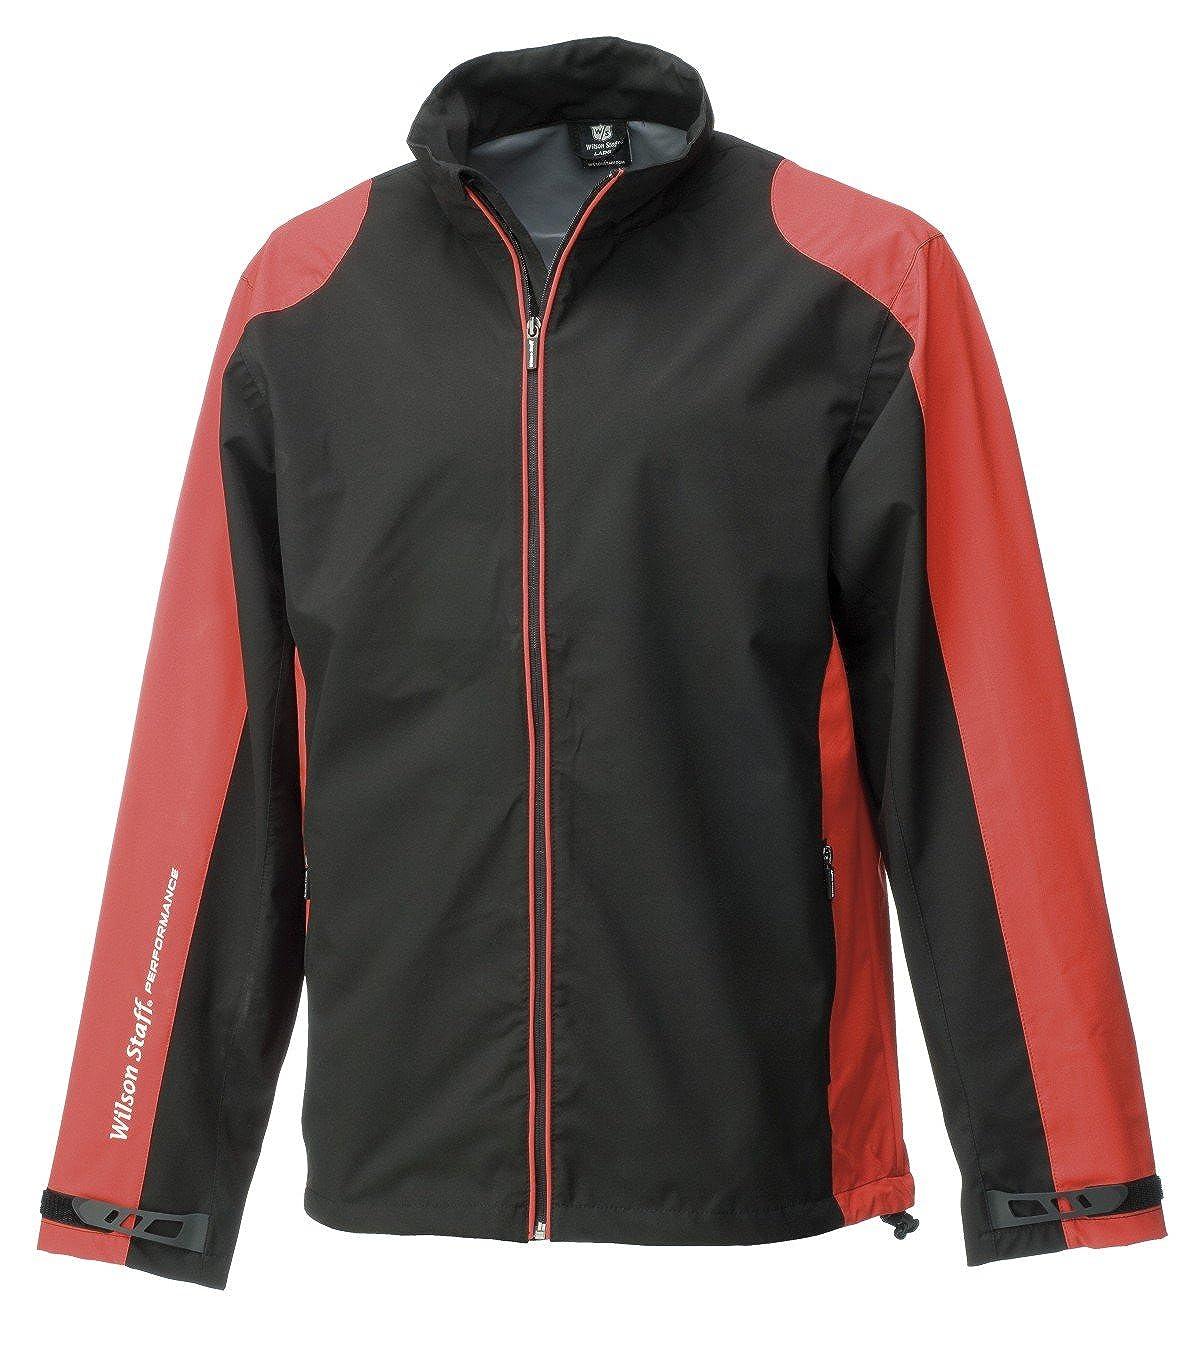 WILSON Rain Jacket Mens Performance Chaqueta Impermeable de Golf, Hombre